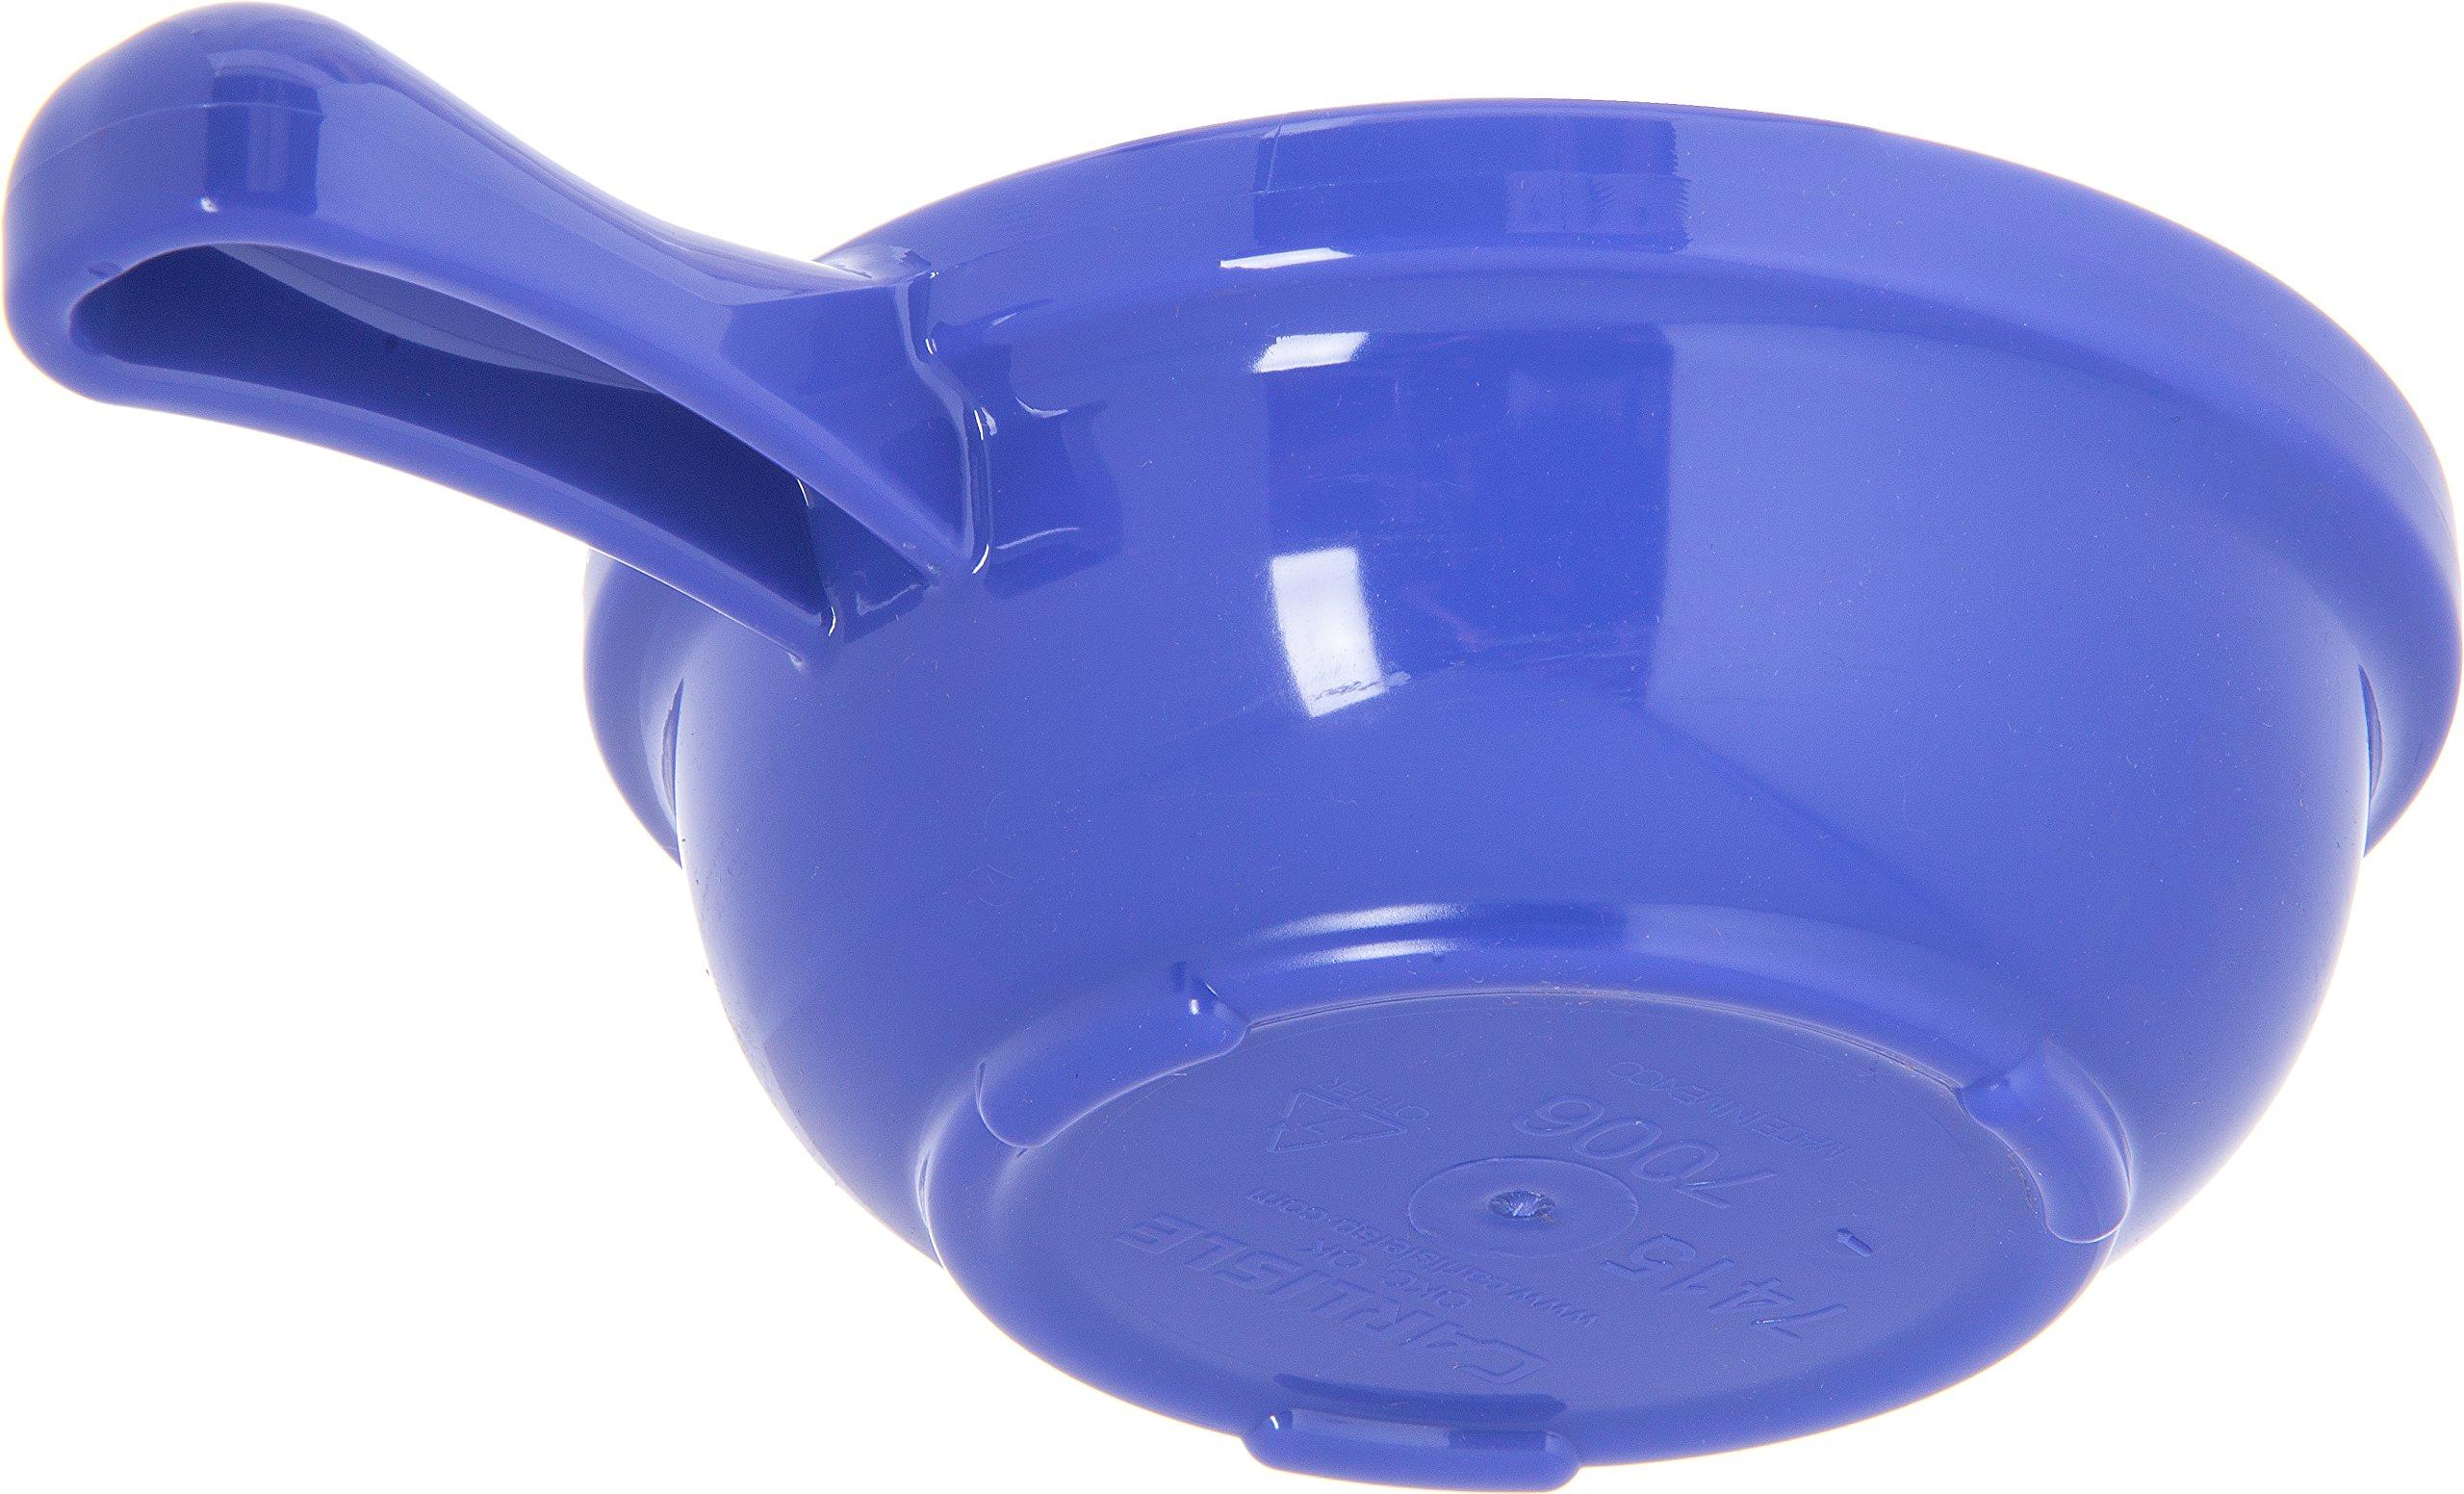 Carlisle 700614 Plastic Handled Soup Bowl, 8 oz., Ocean Blue (Pack of 24) by Carlisle (Image #5)